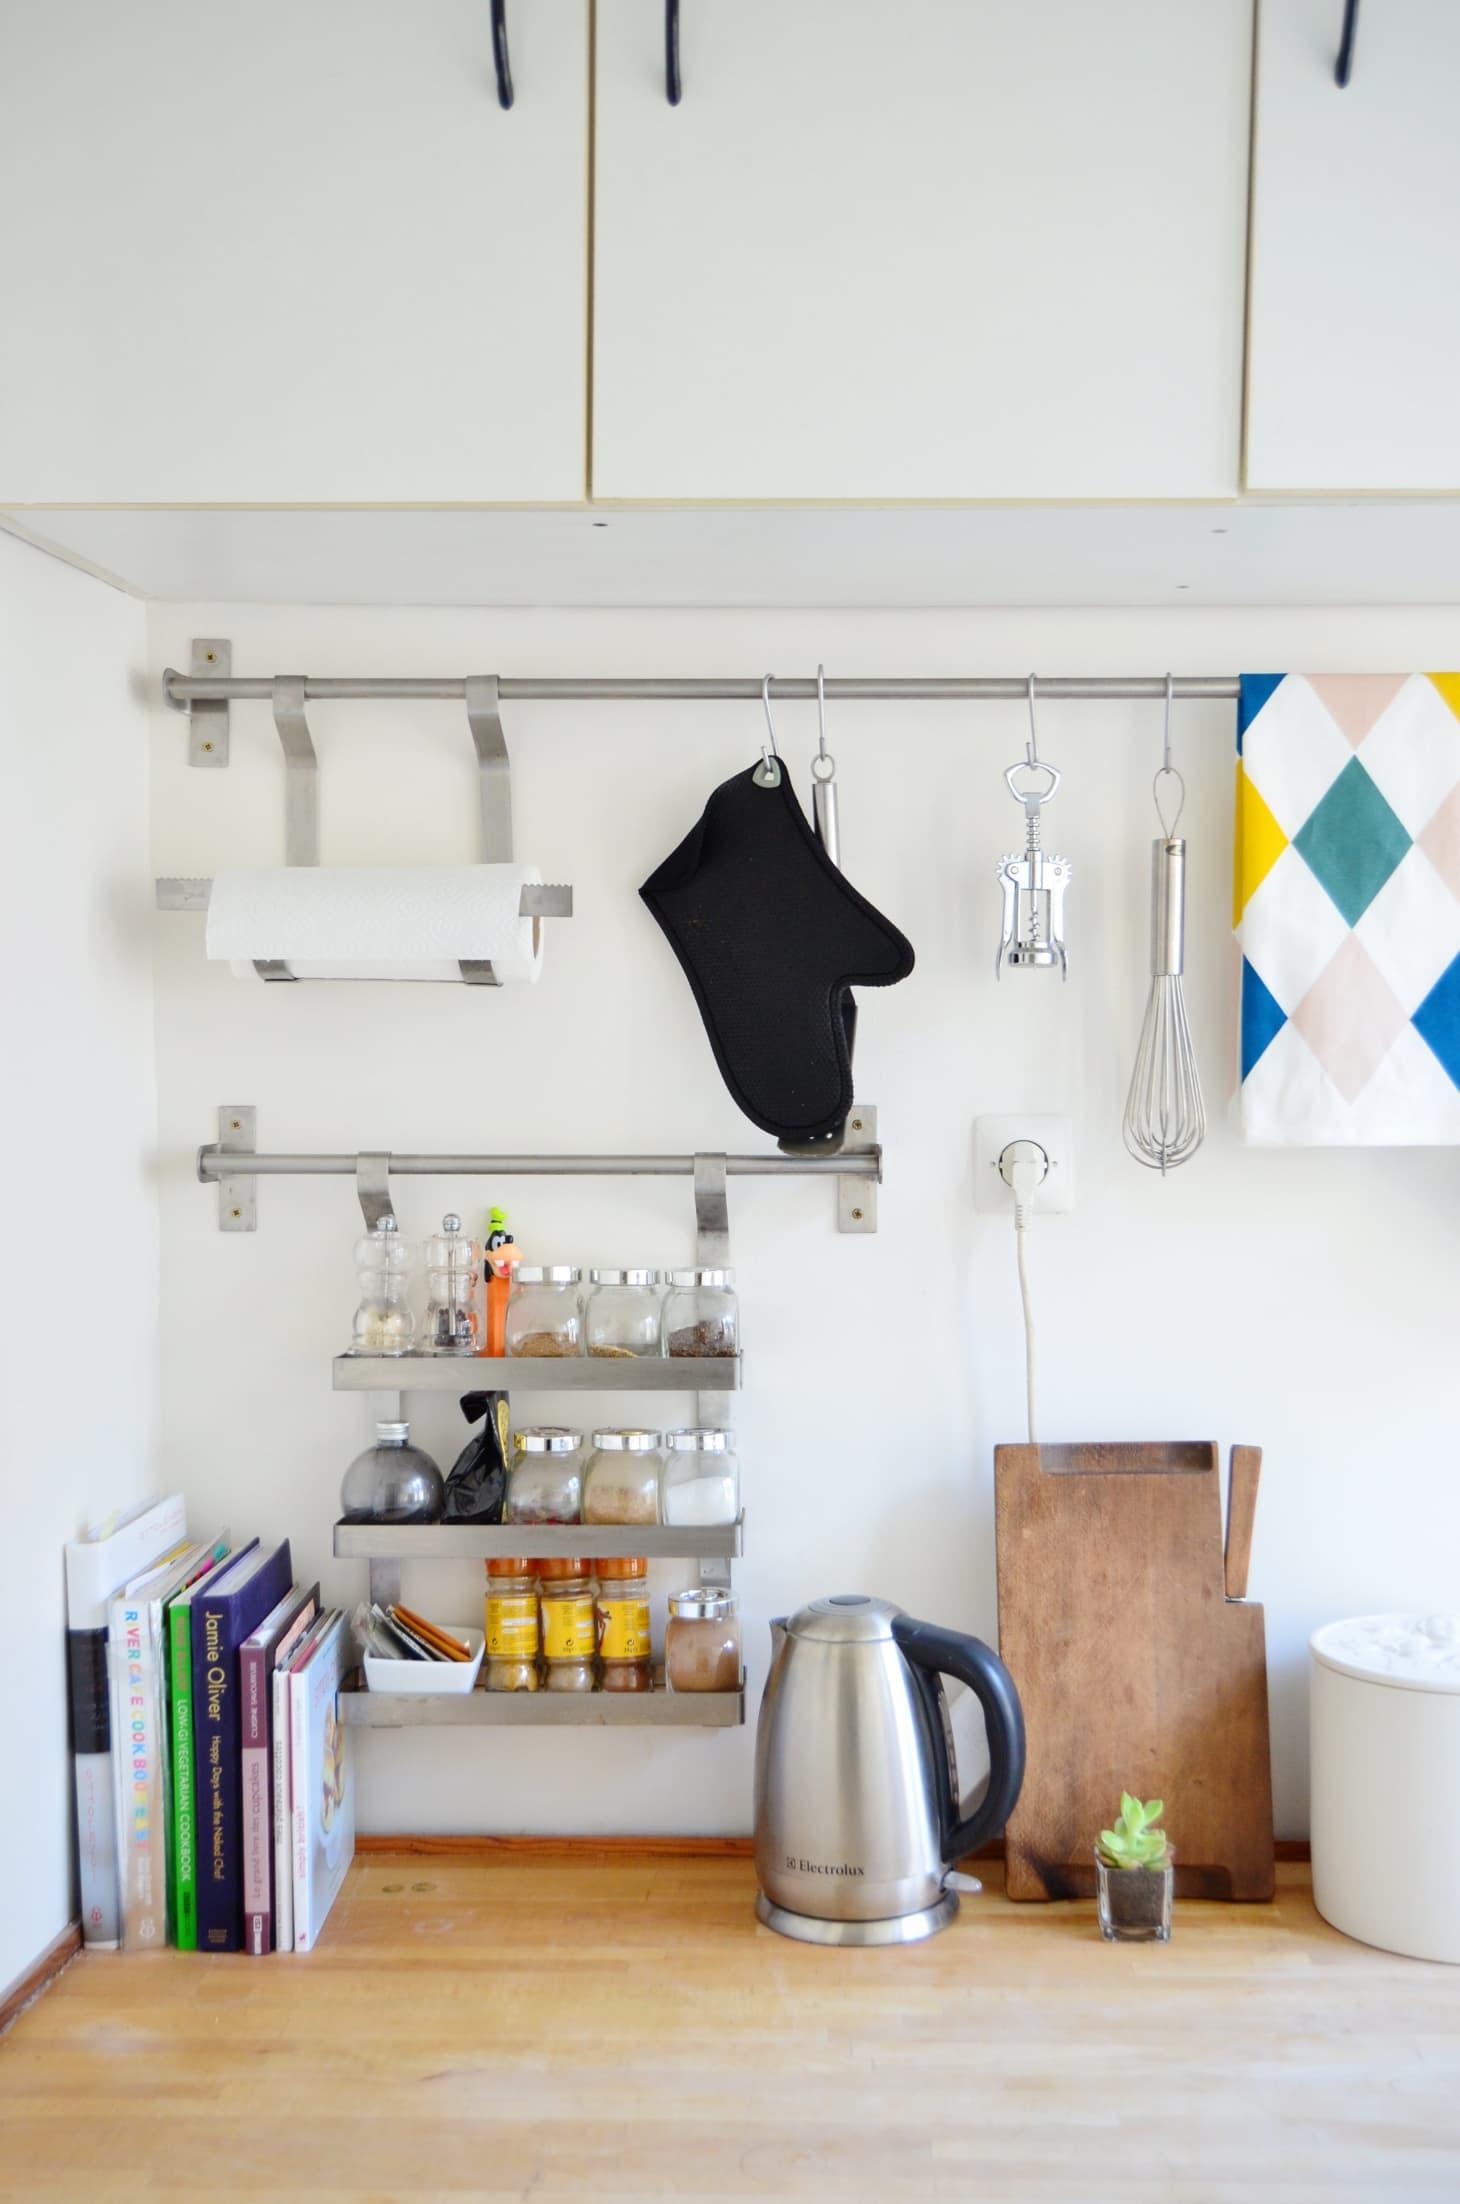 Storage Ideas for Small Kitchens | Kitchn - photo#16